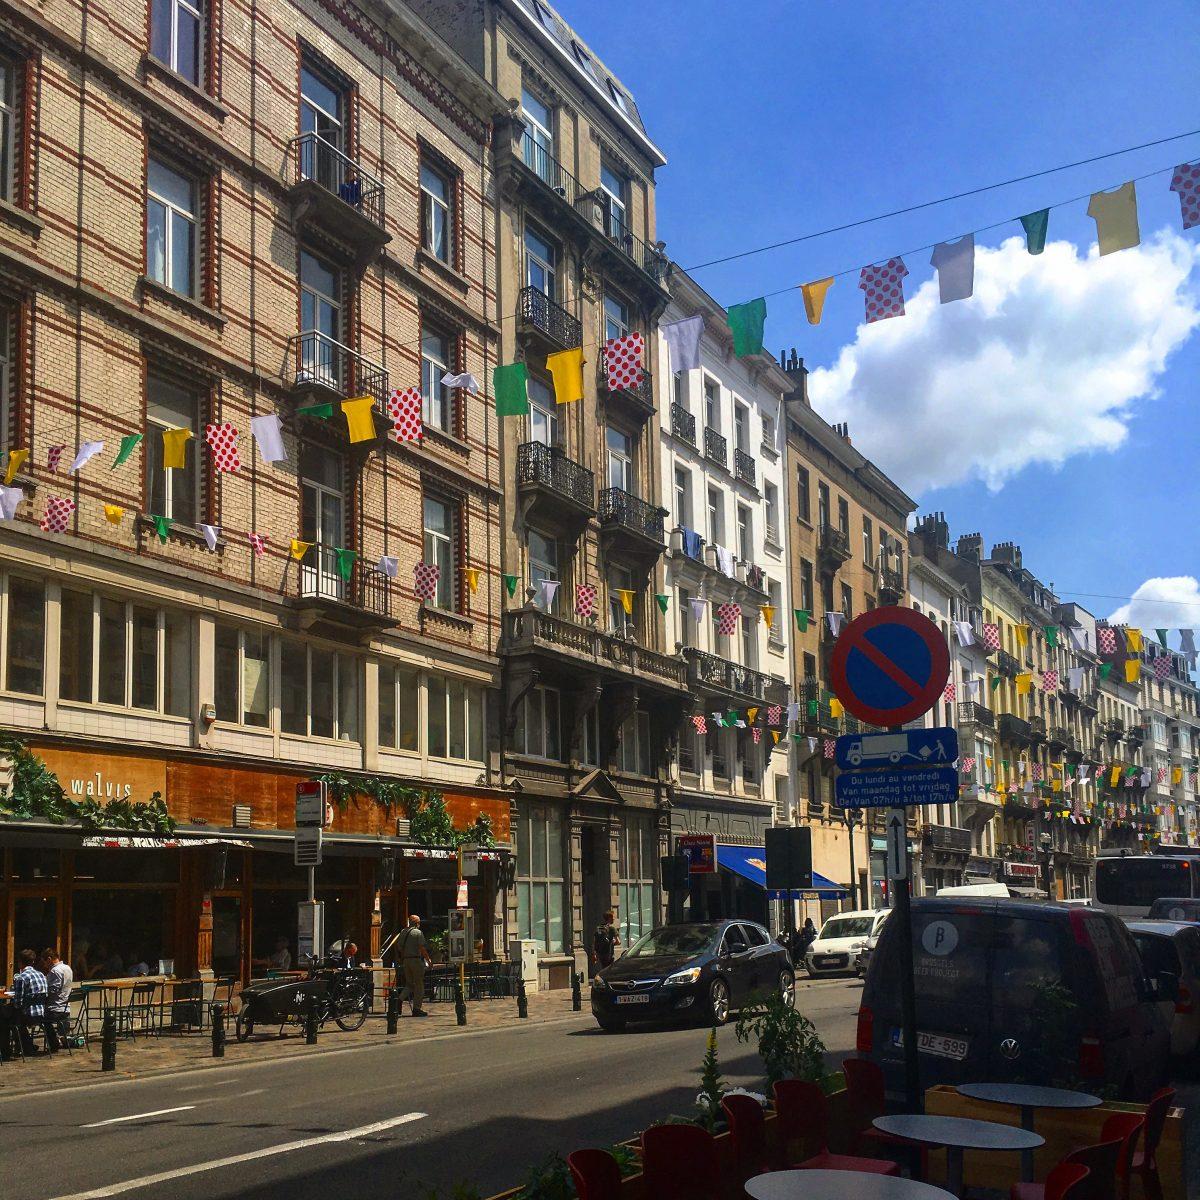 Brysselin kadut